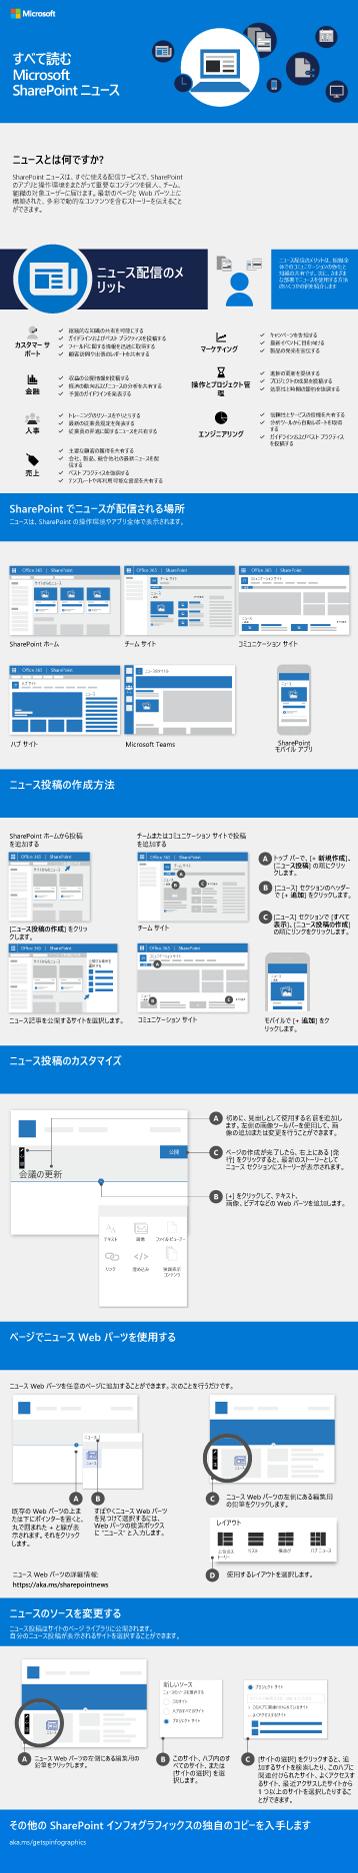 SharePoint ニュース インフォグラフィック